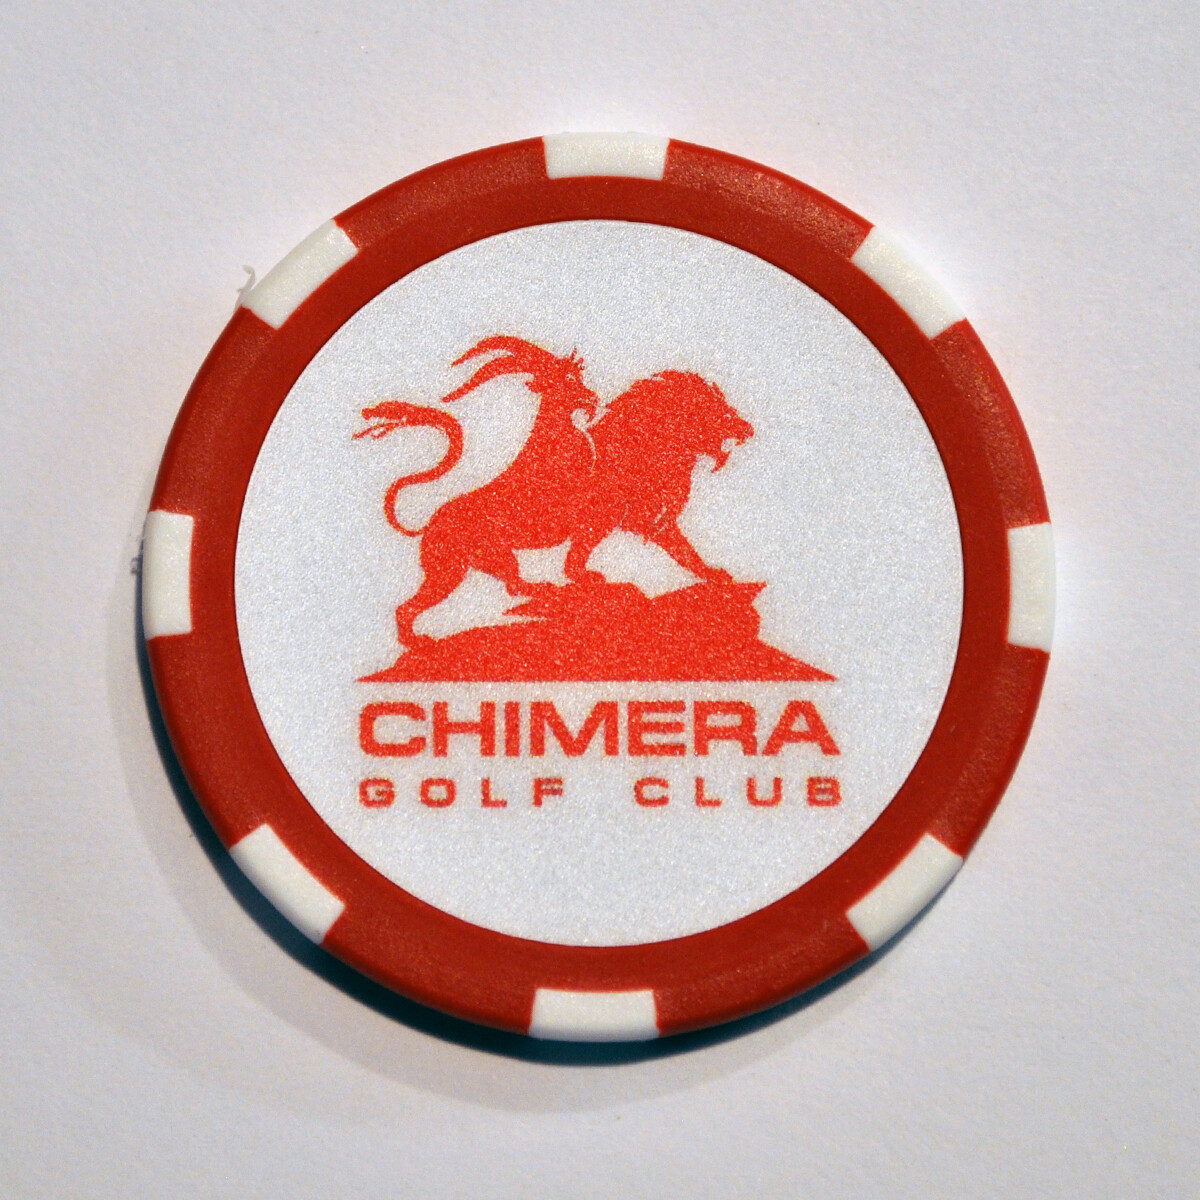 Poker Chip - Chimera - Red/White